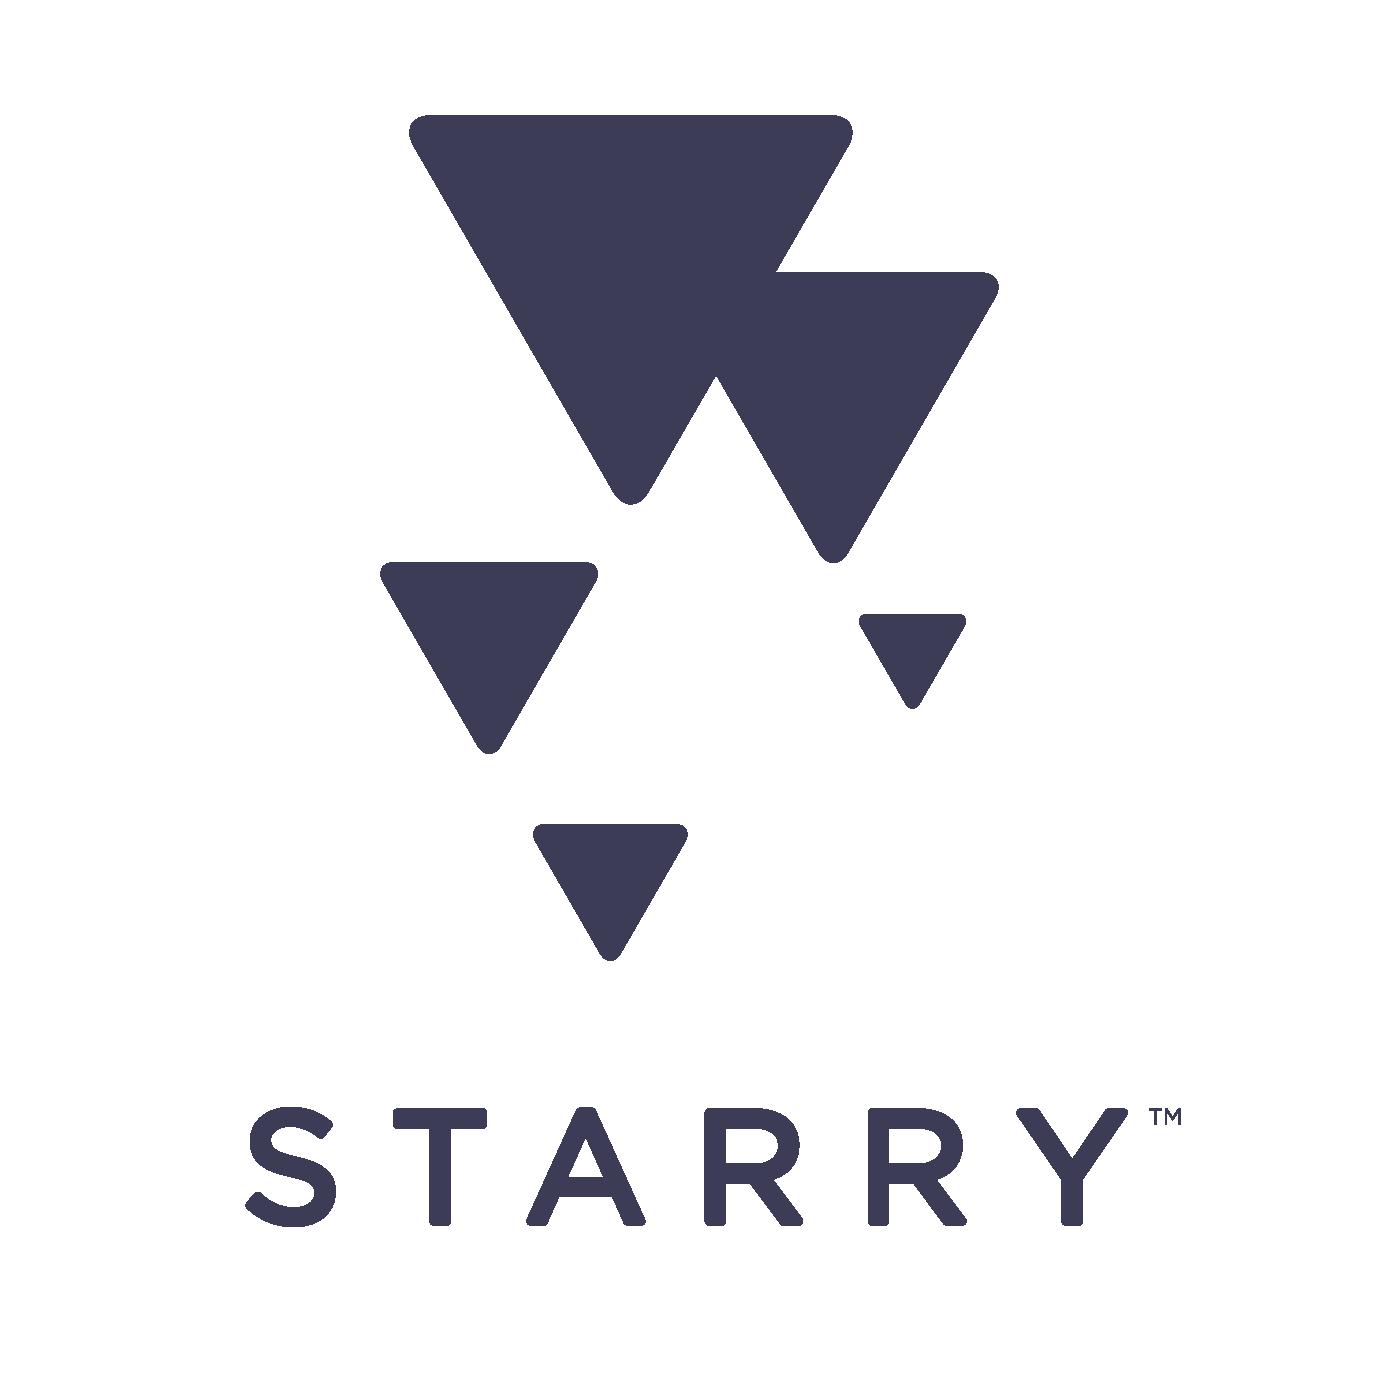 Starry logo